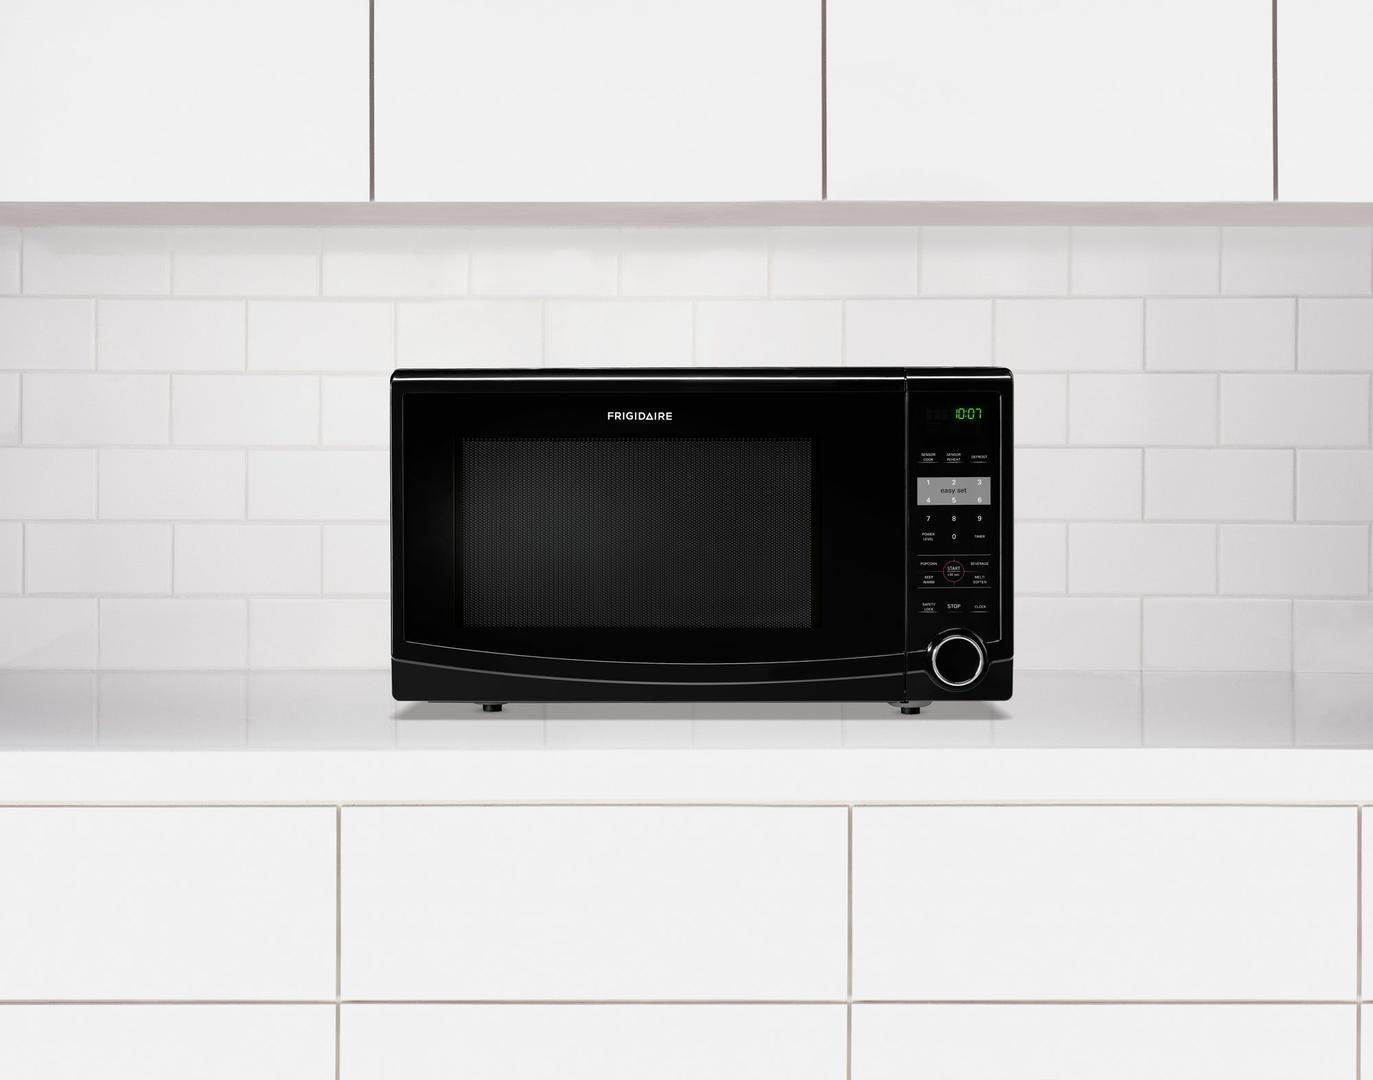 Frigidaire Ffcm1134lw 1 1 Cu Ft Countertop Microwave